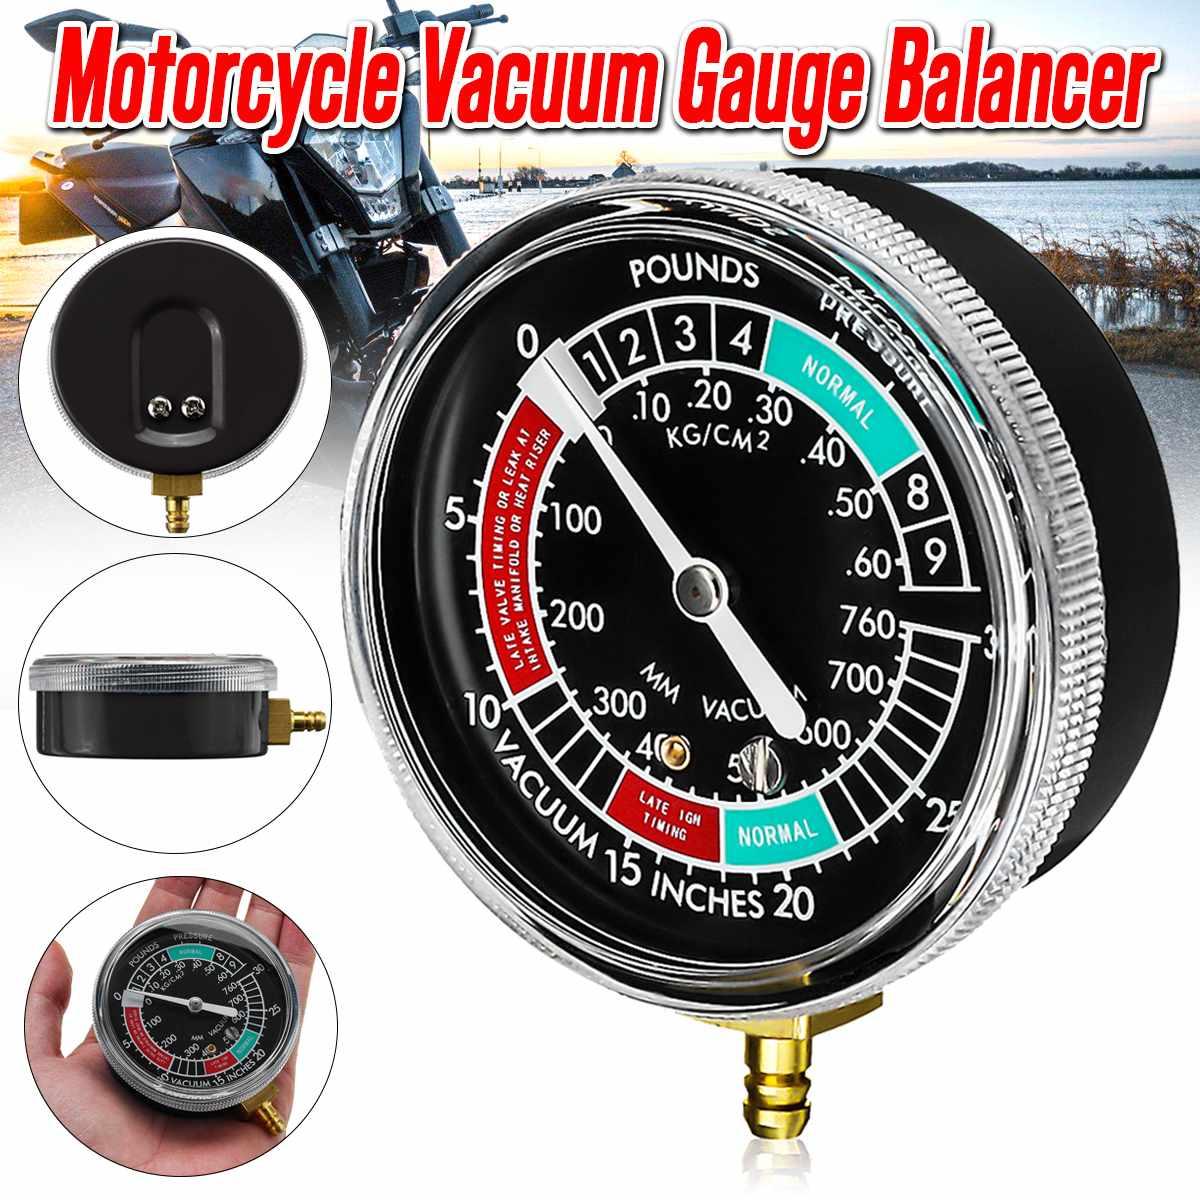 Car Motorcycle Fuel Vacuum Gauge Carburetor Carb Synchronizer Gauge Meter Balancer Gauge Tool Universal